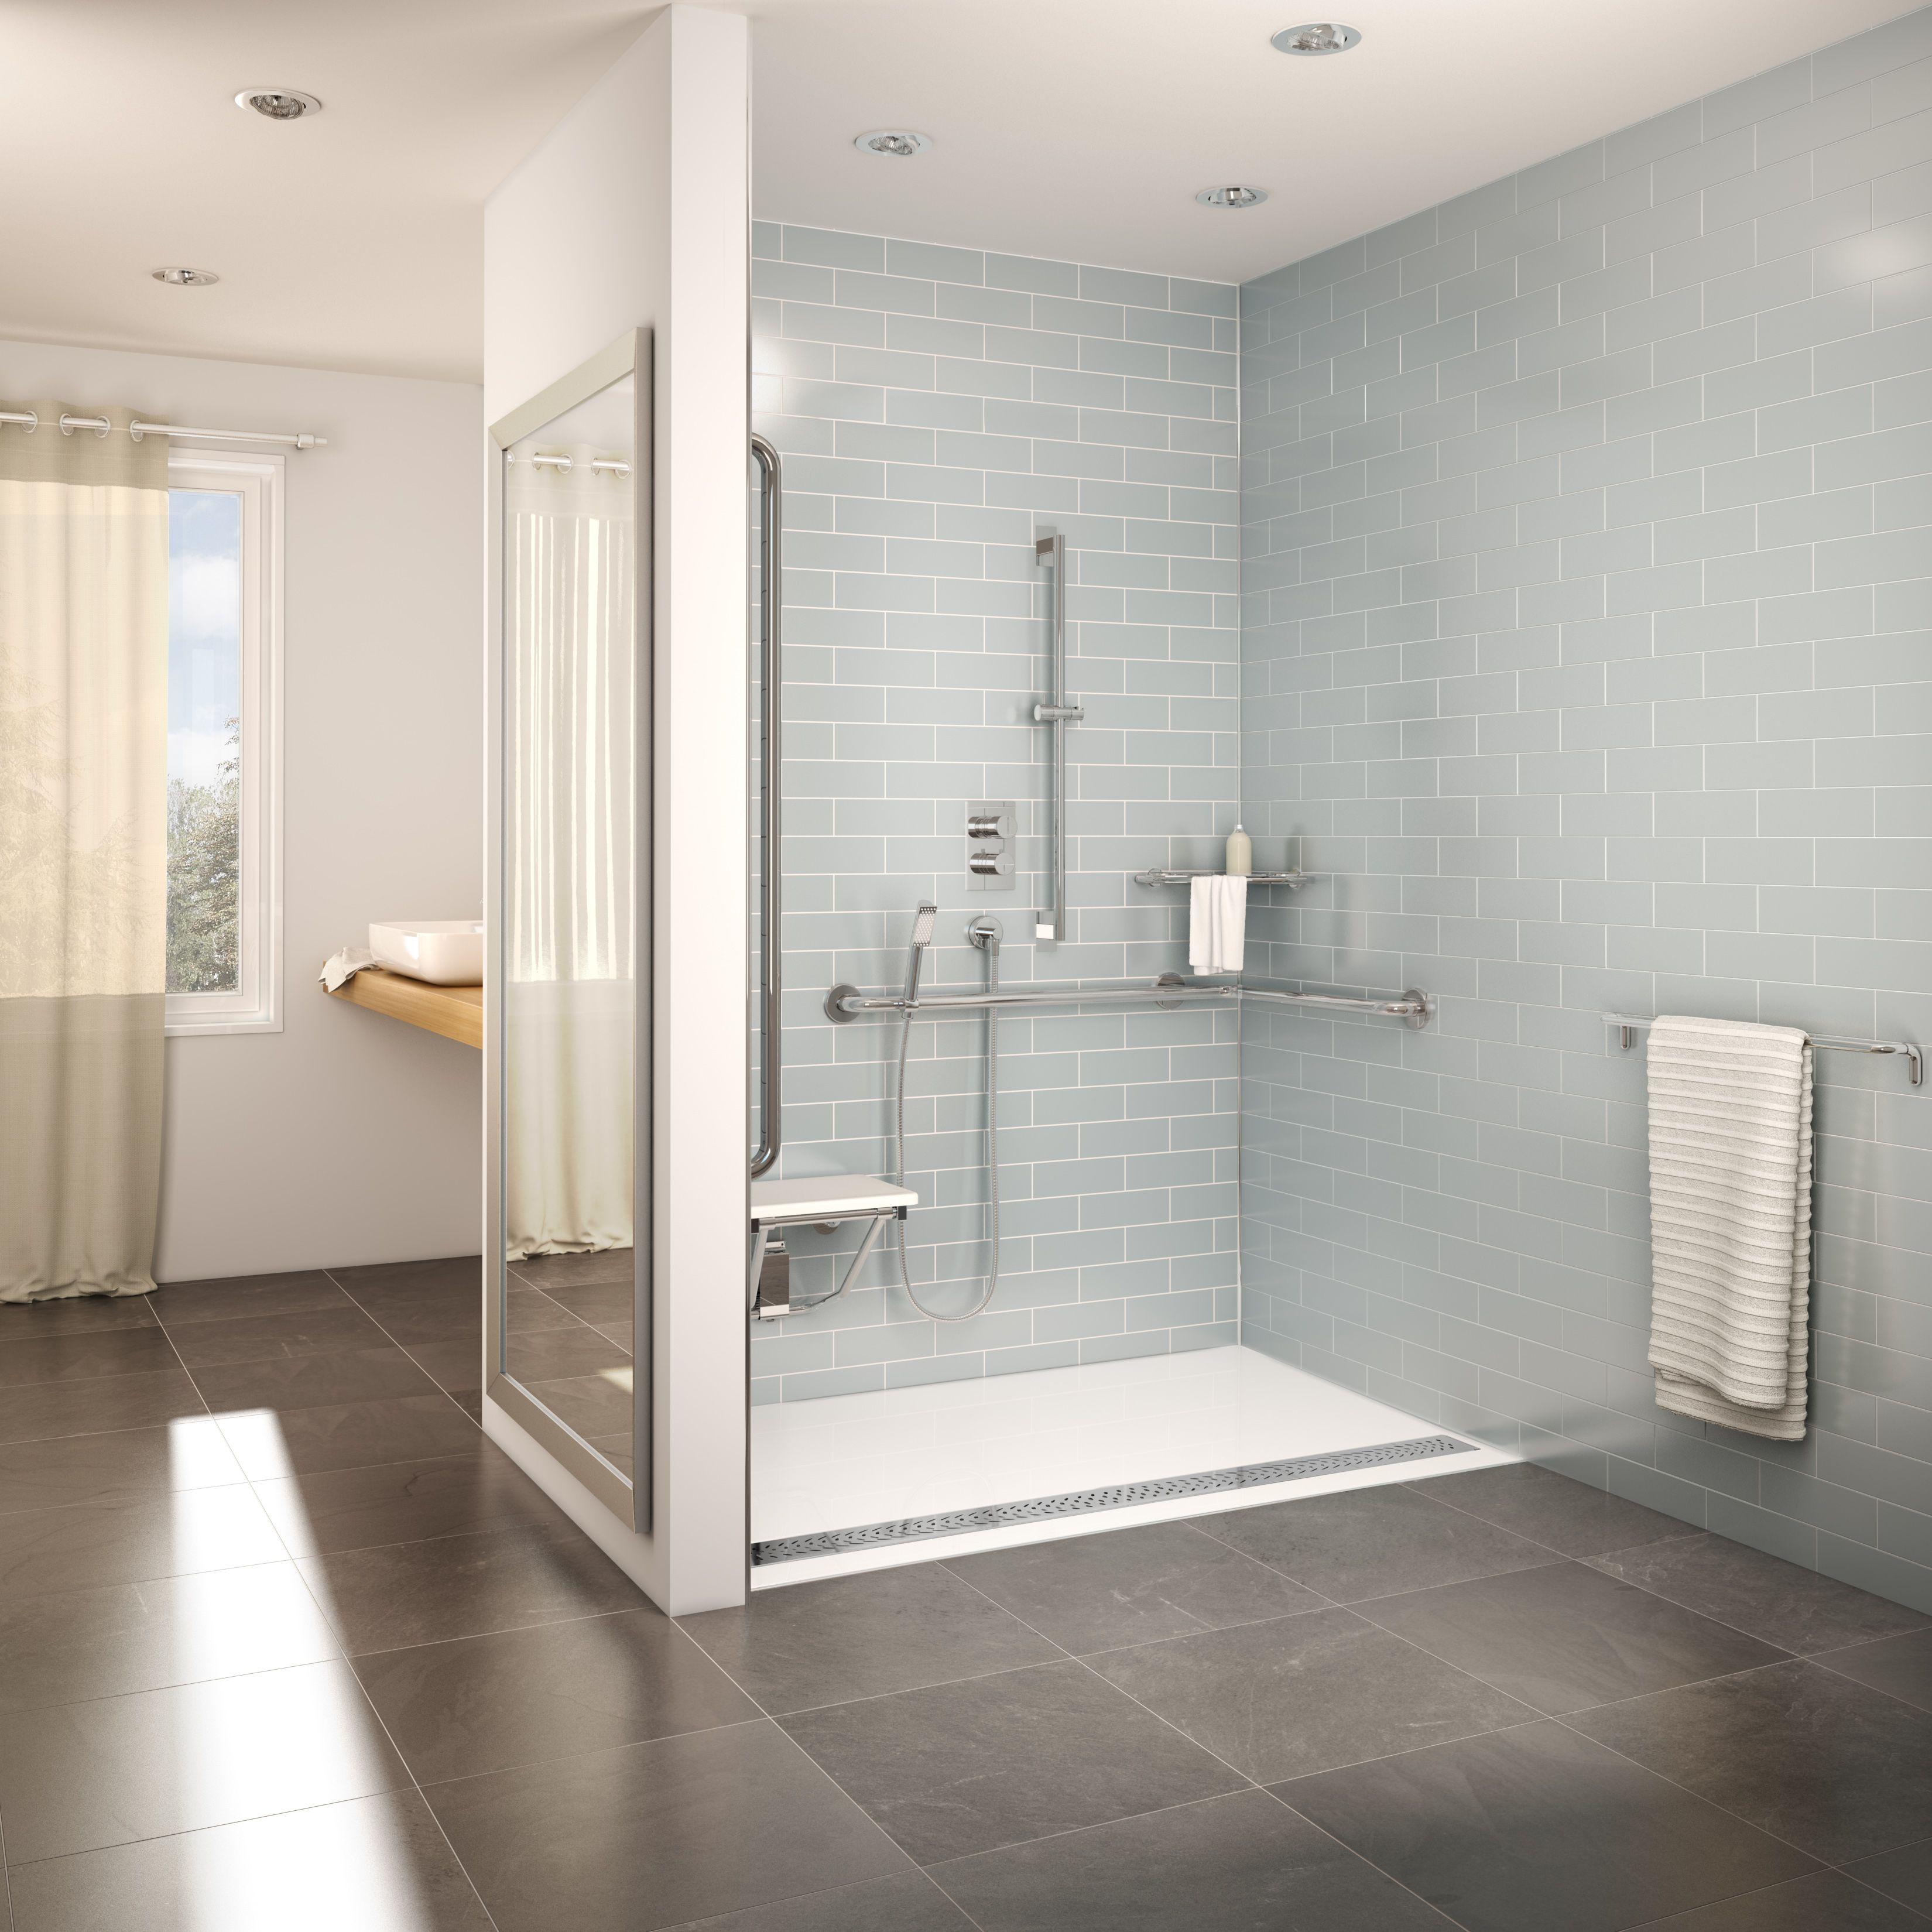 FLEURCO ADaptek Shower base roll-in typ | Fleurco Bathroom Products ...